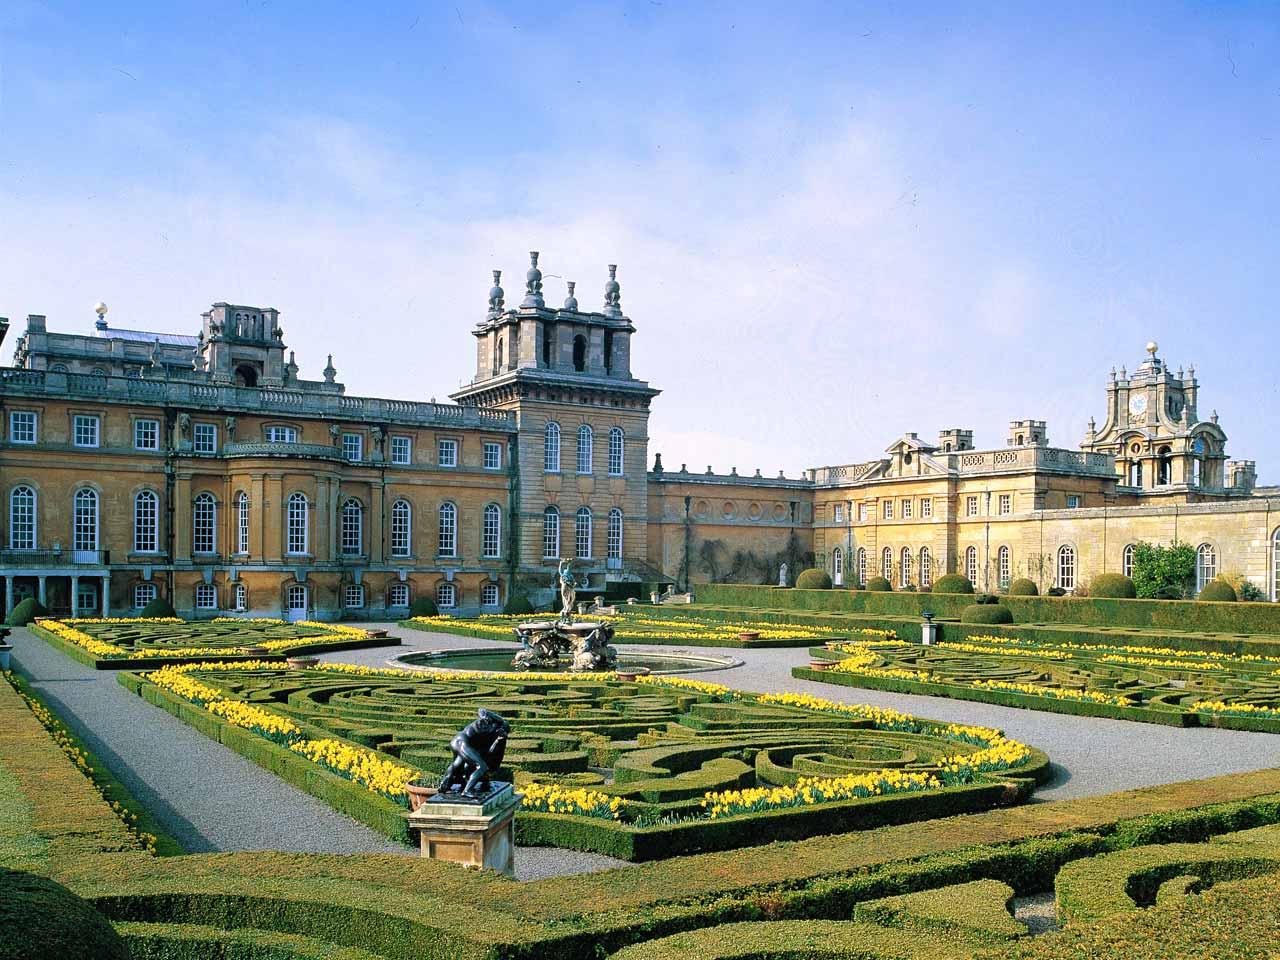 BLENHEIM PALACE & OXFORD